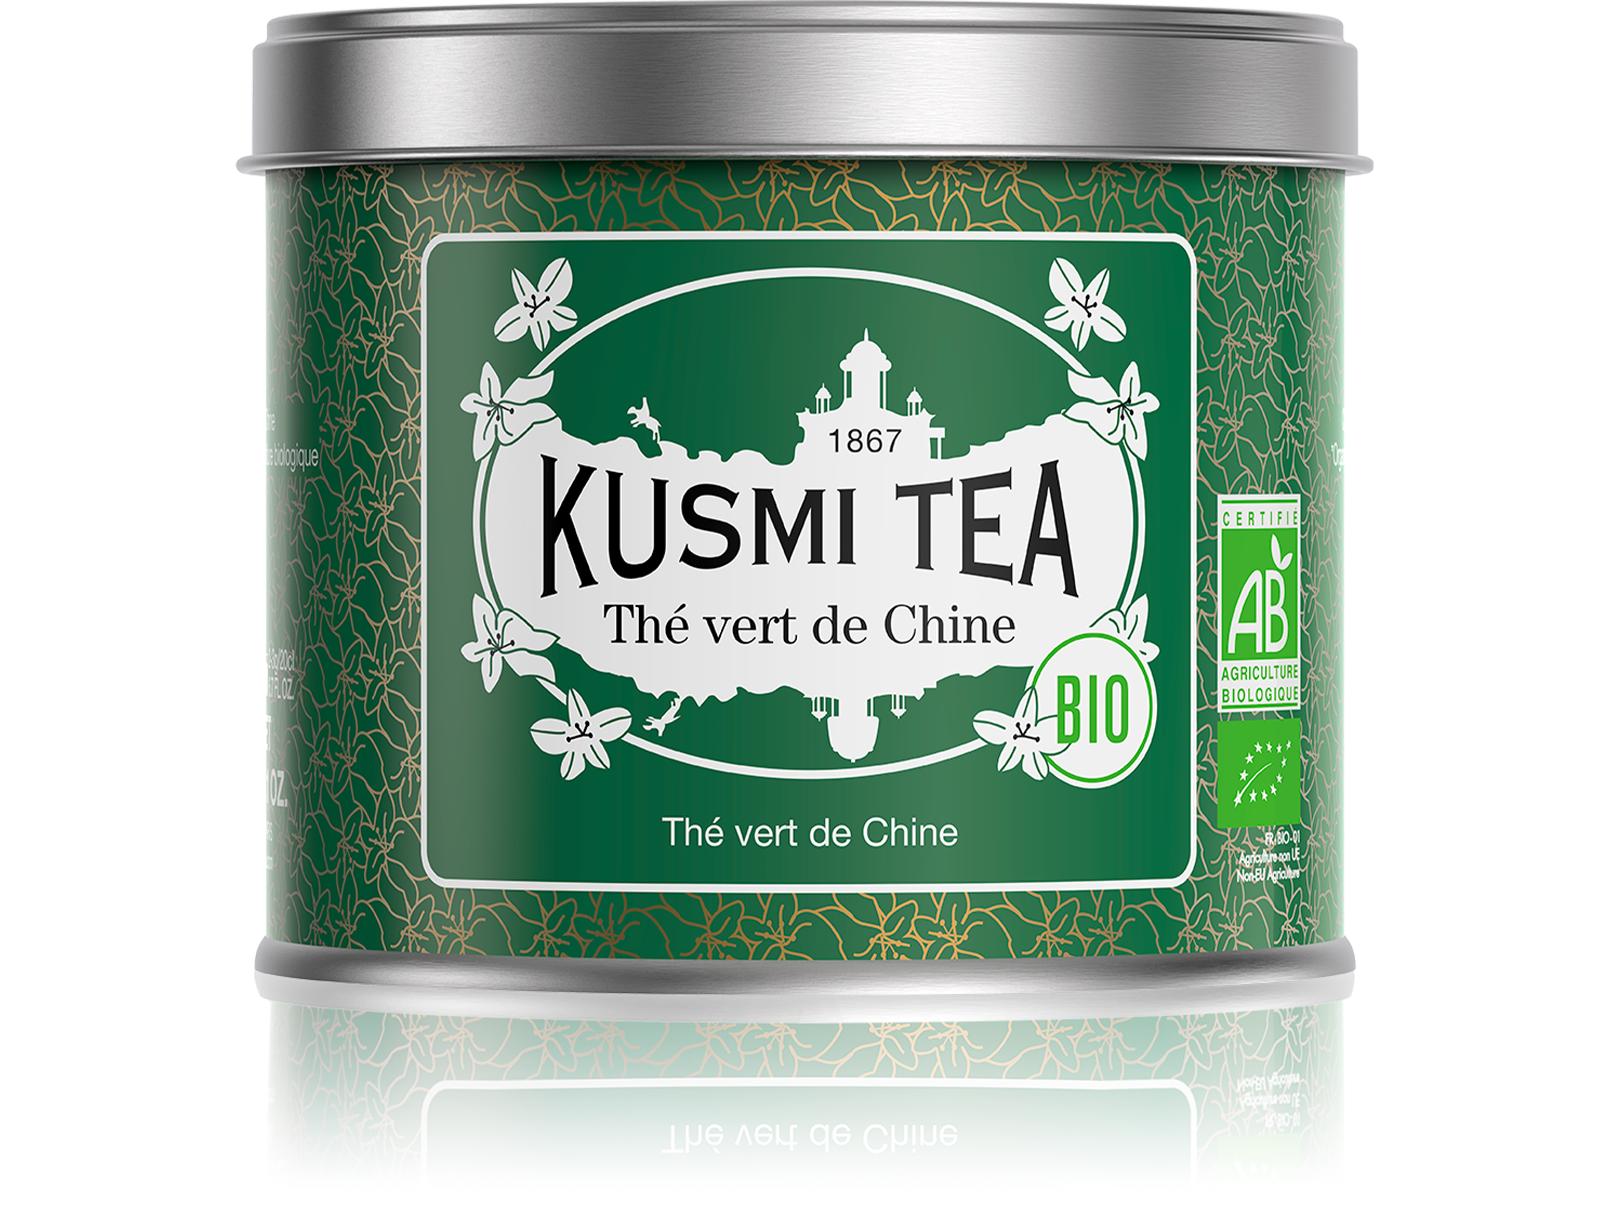 KUSMI TEA Thé Vert de Chine bio - Thé vert de Chine - Kusmi Tea